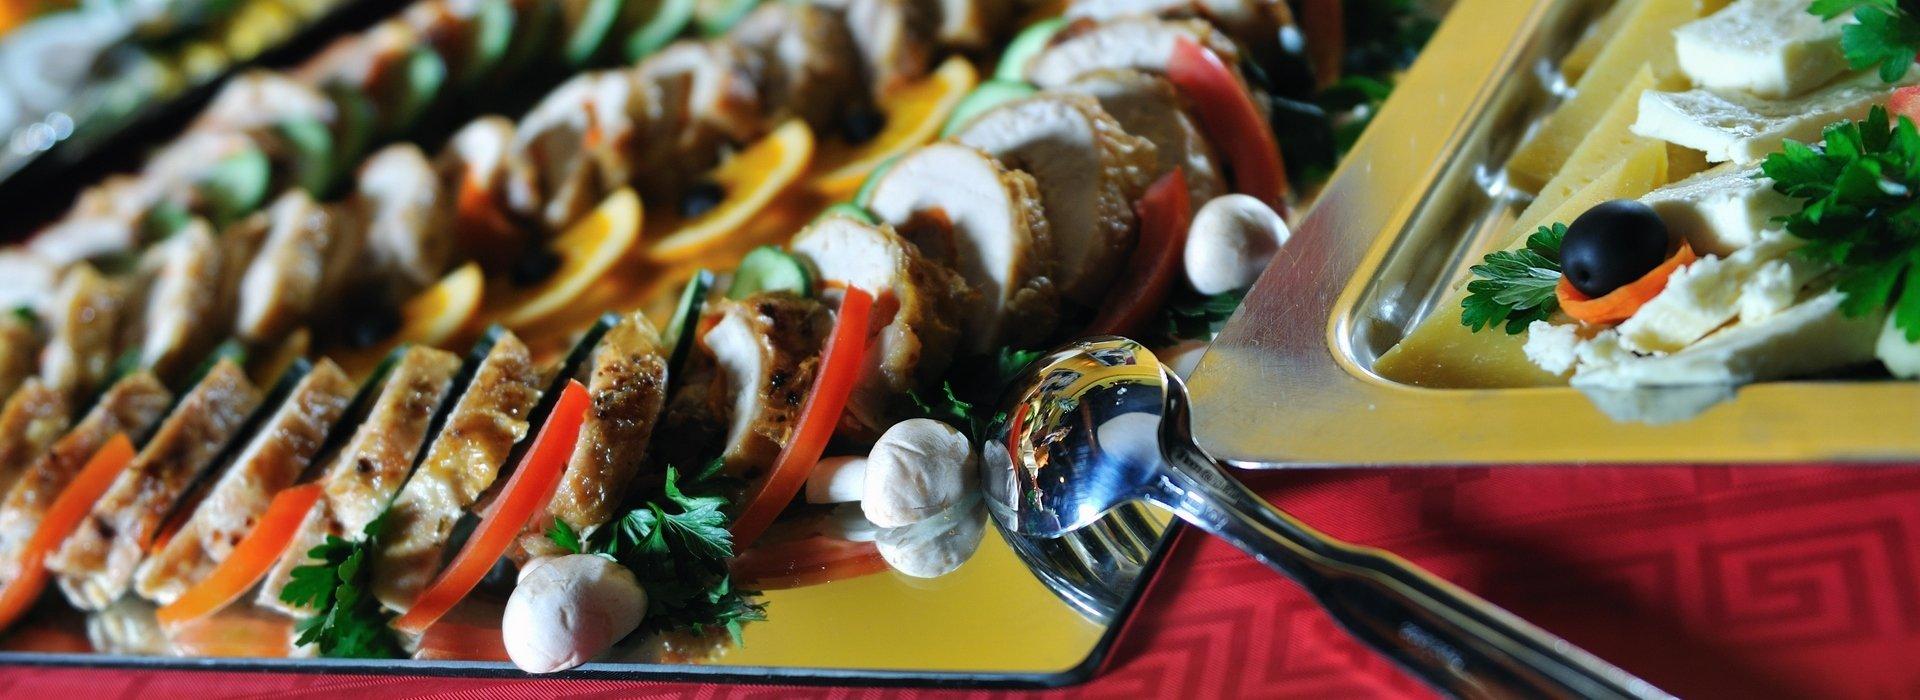 Budapesti Catering Szolgáltatás – Catering Service Budapesten